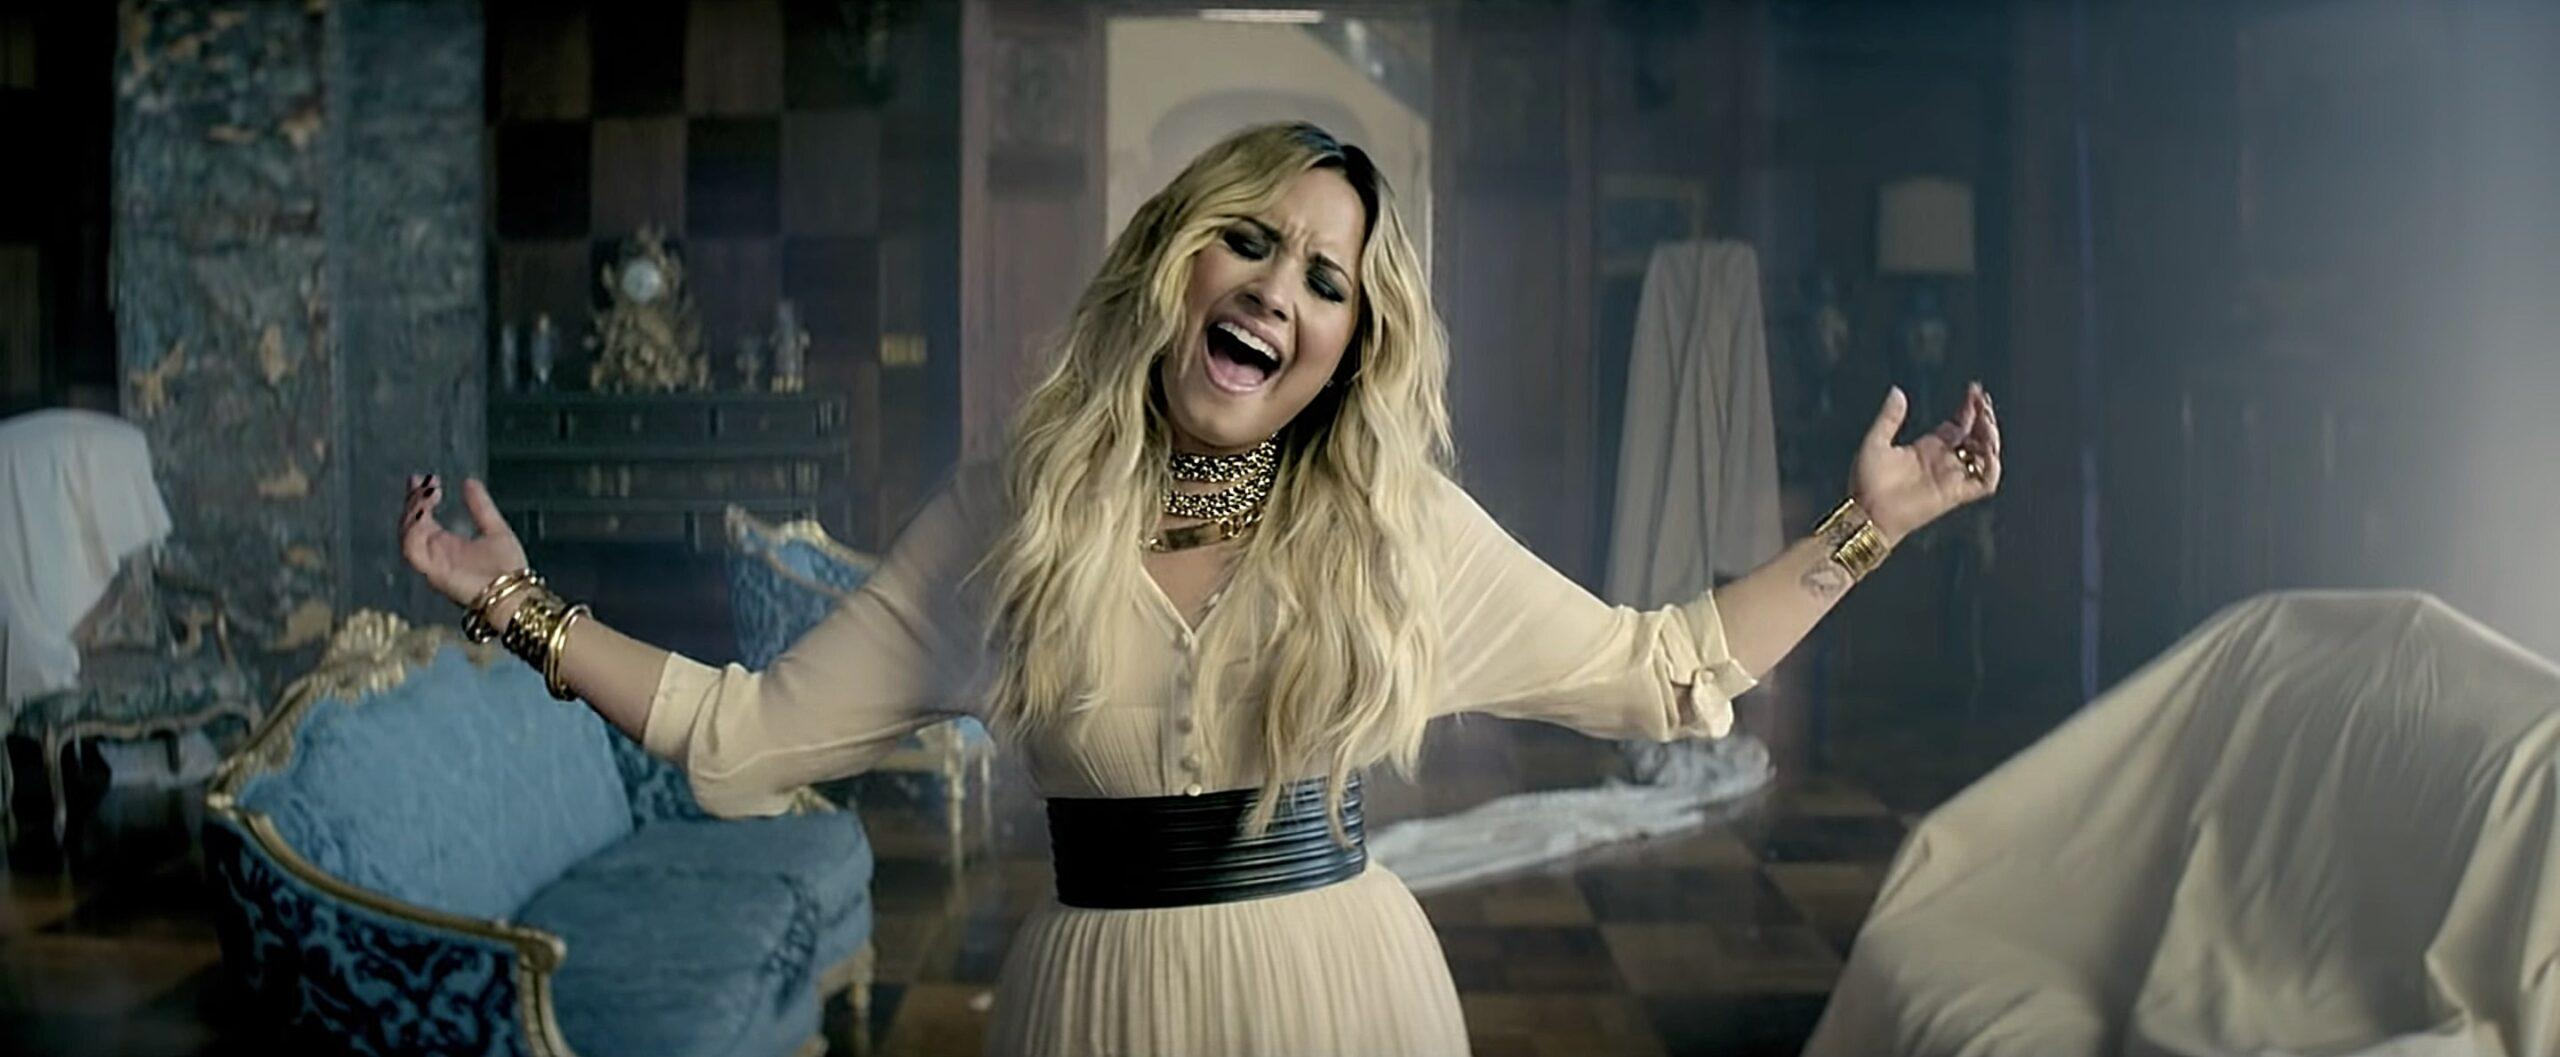 Demi Lovato Screencap Let it Go